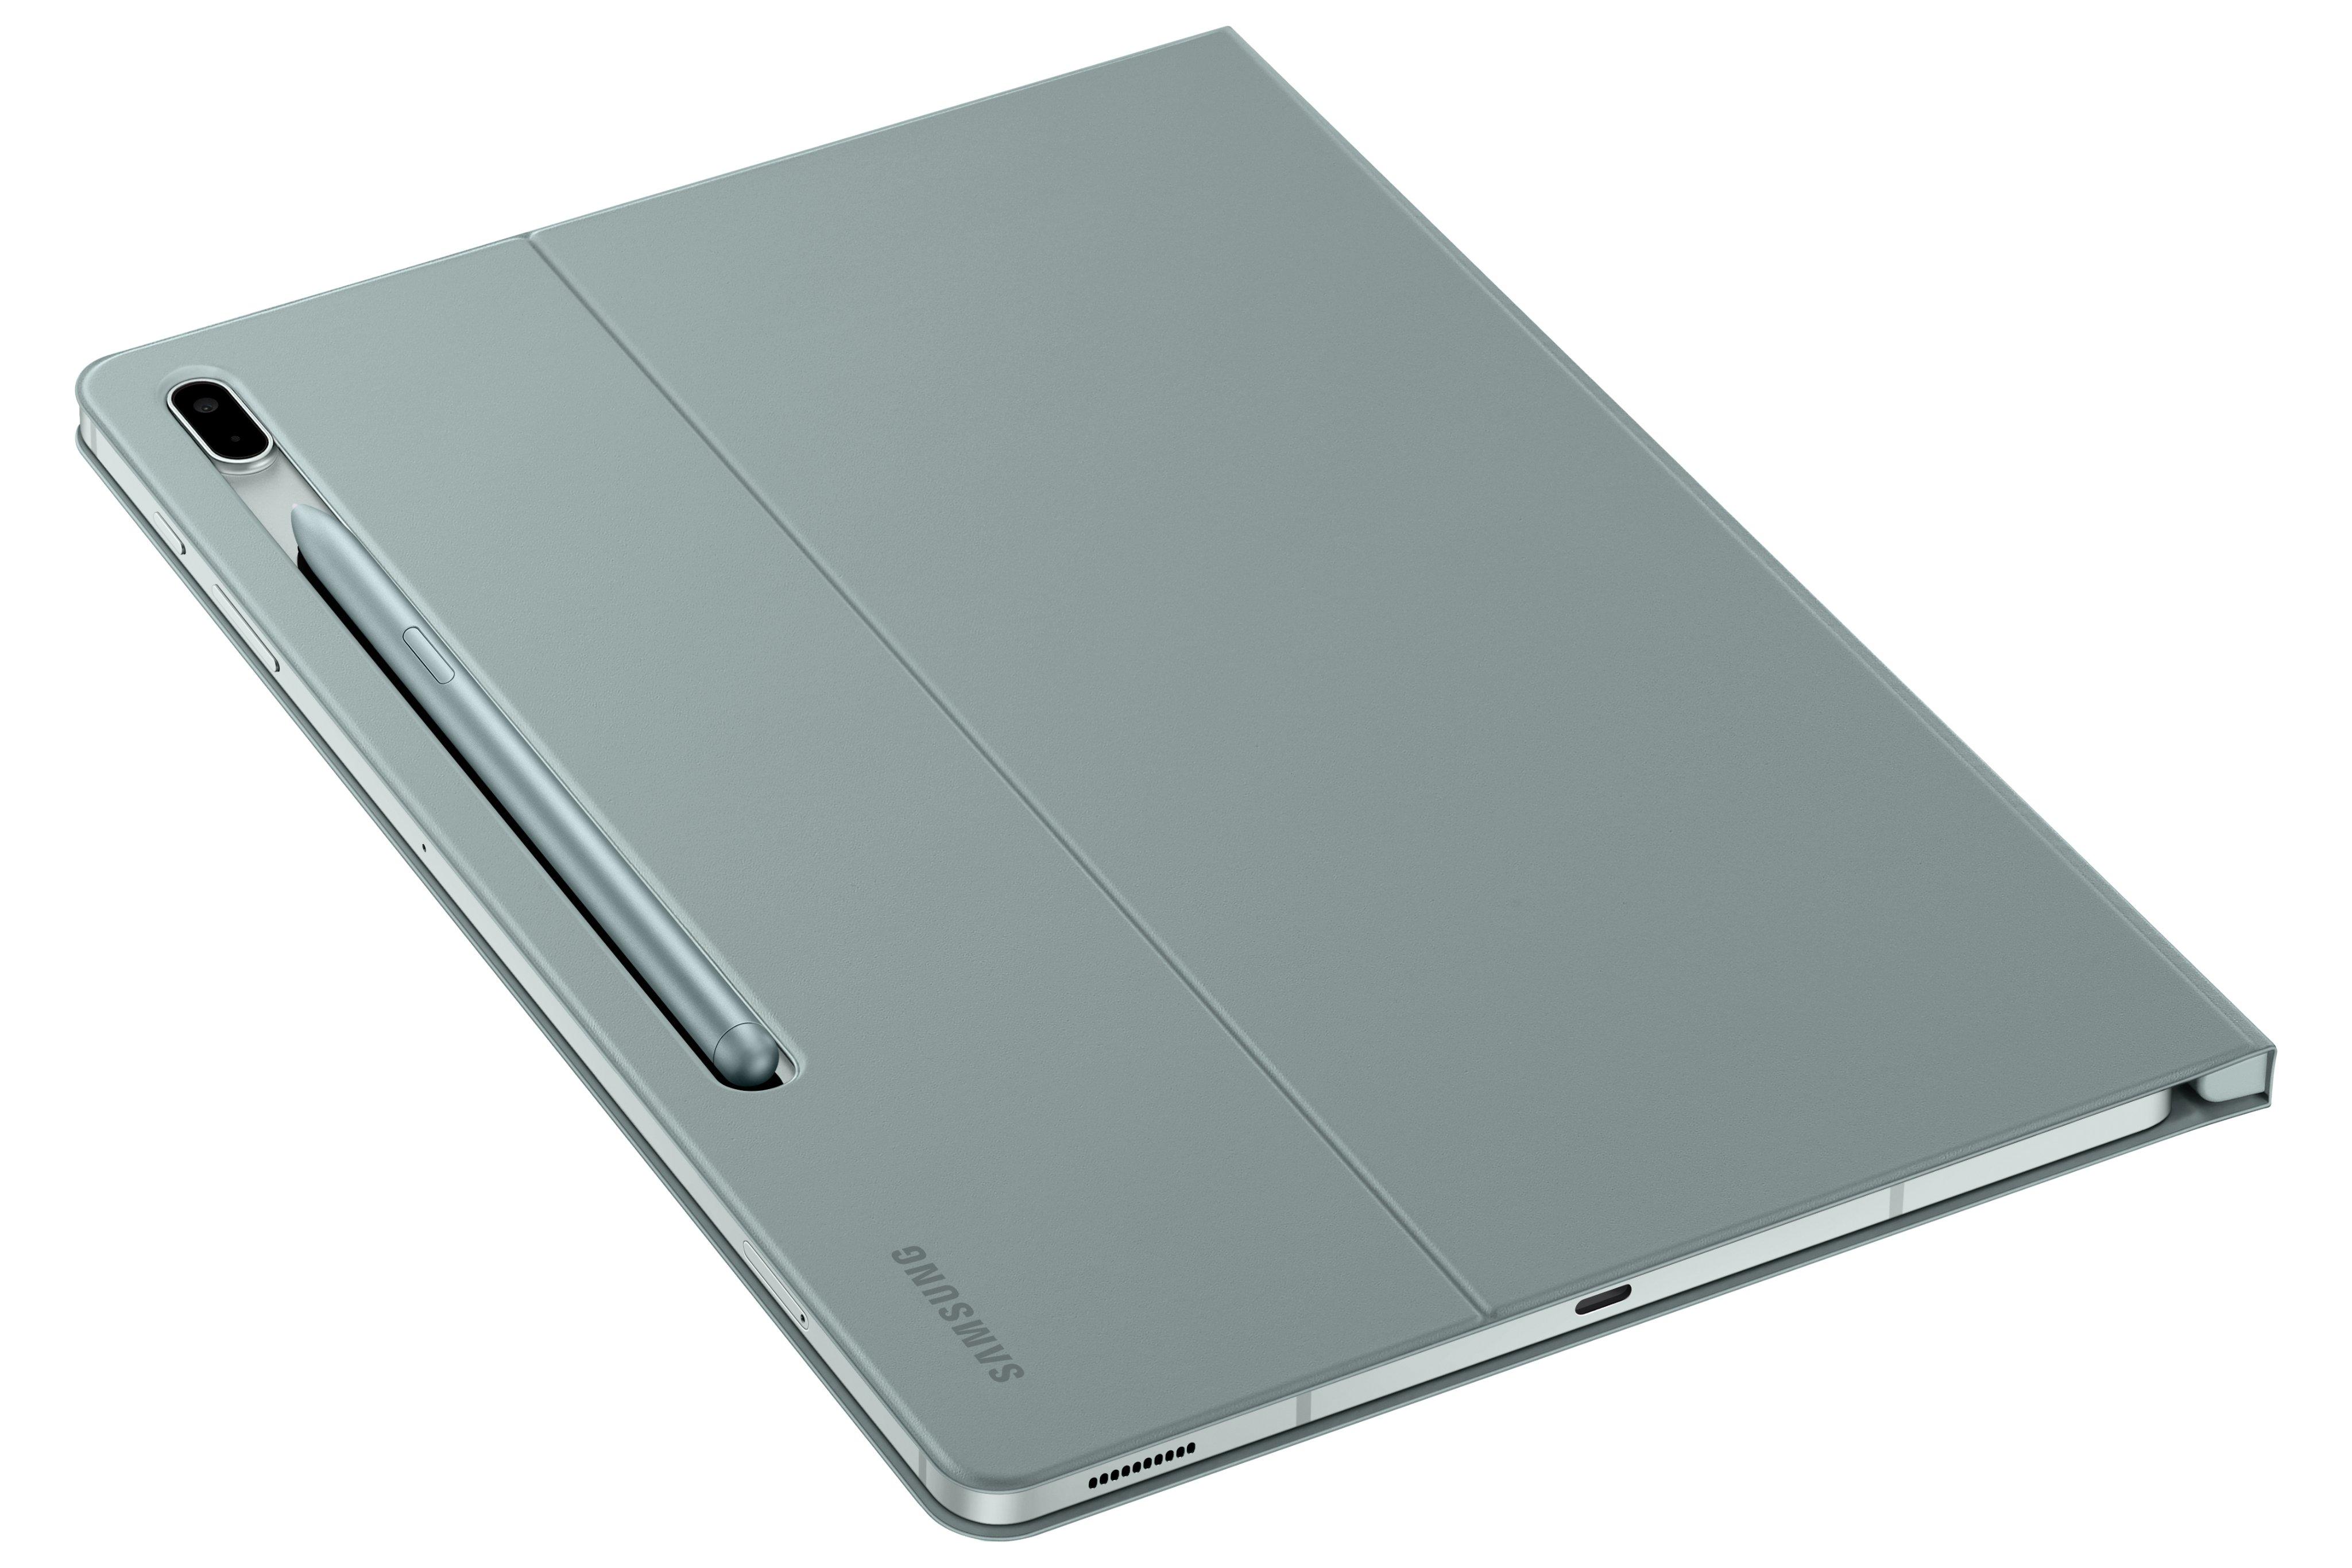 Samsung Galaxy Tab S7+ Lite в четырёх новых цветах Samsung  - samsung_galaxy_tab_s7_lite_vo_vseh_cvetah_i_rakursah_na_press_foto_picture8_3